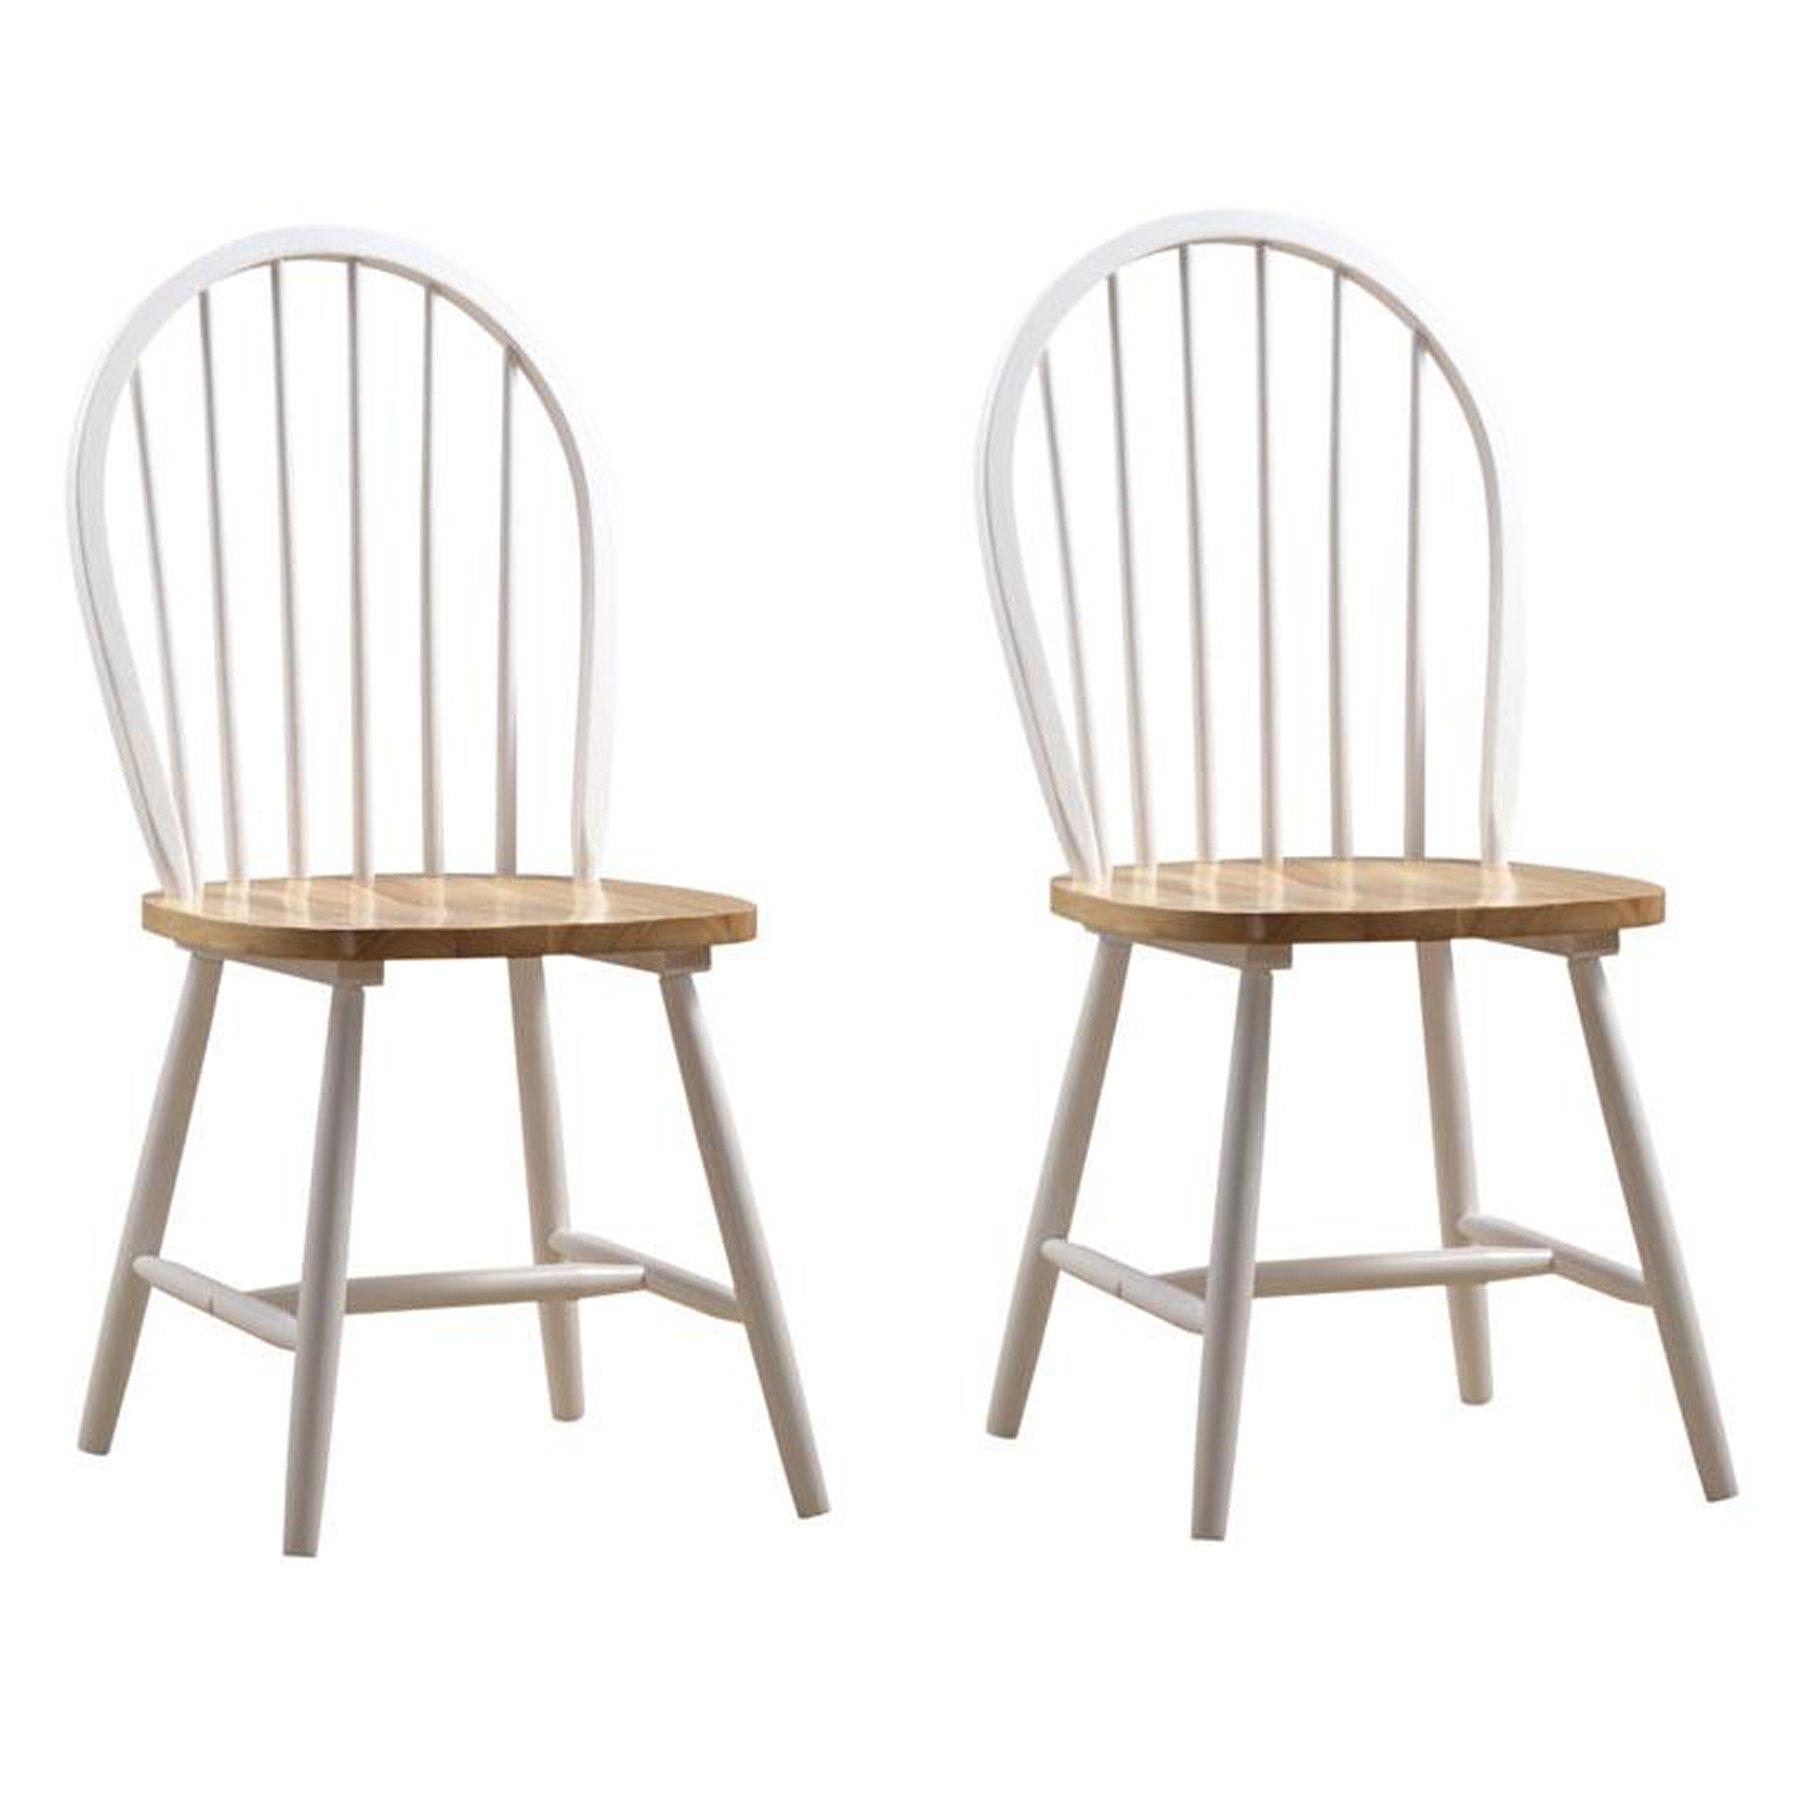 Boraam 31316 Farmhouse Chair, White/Natural, Set of 2 by Boraam (Image #2)